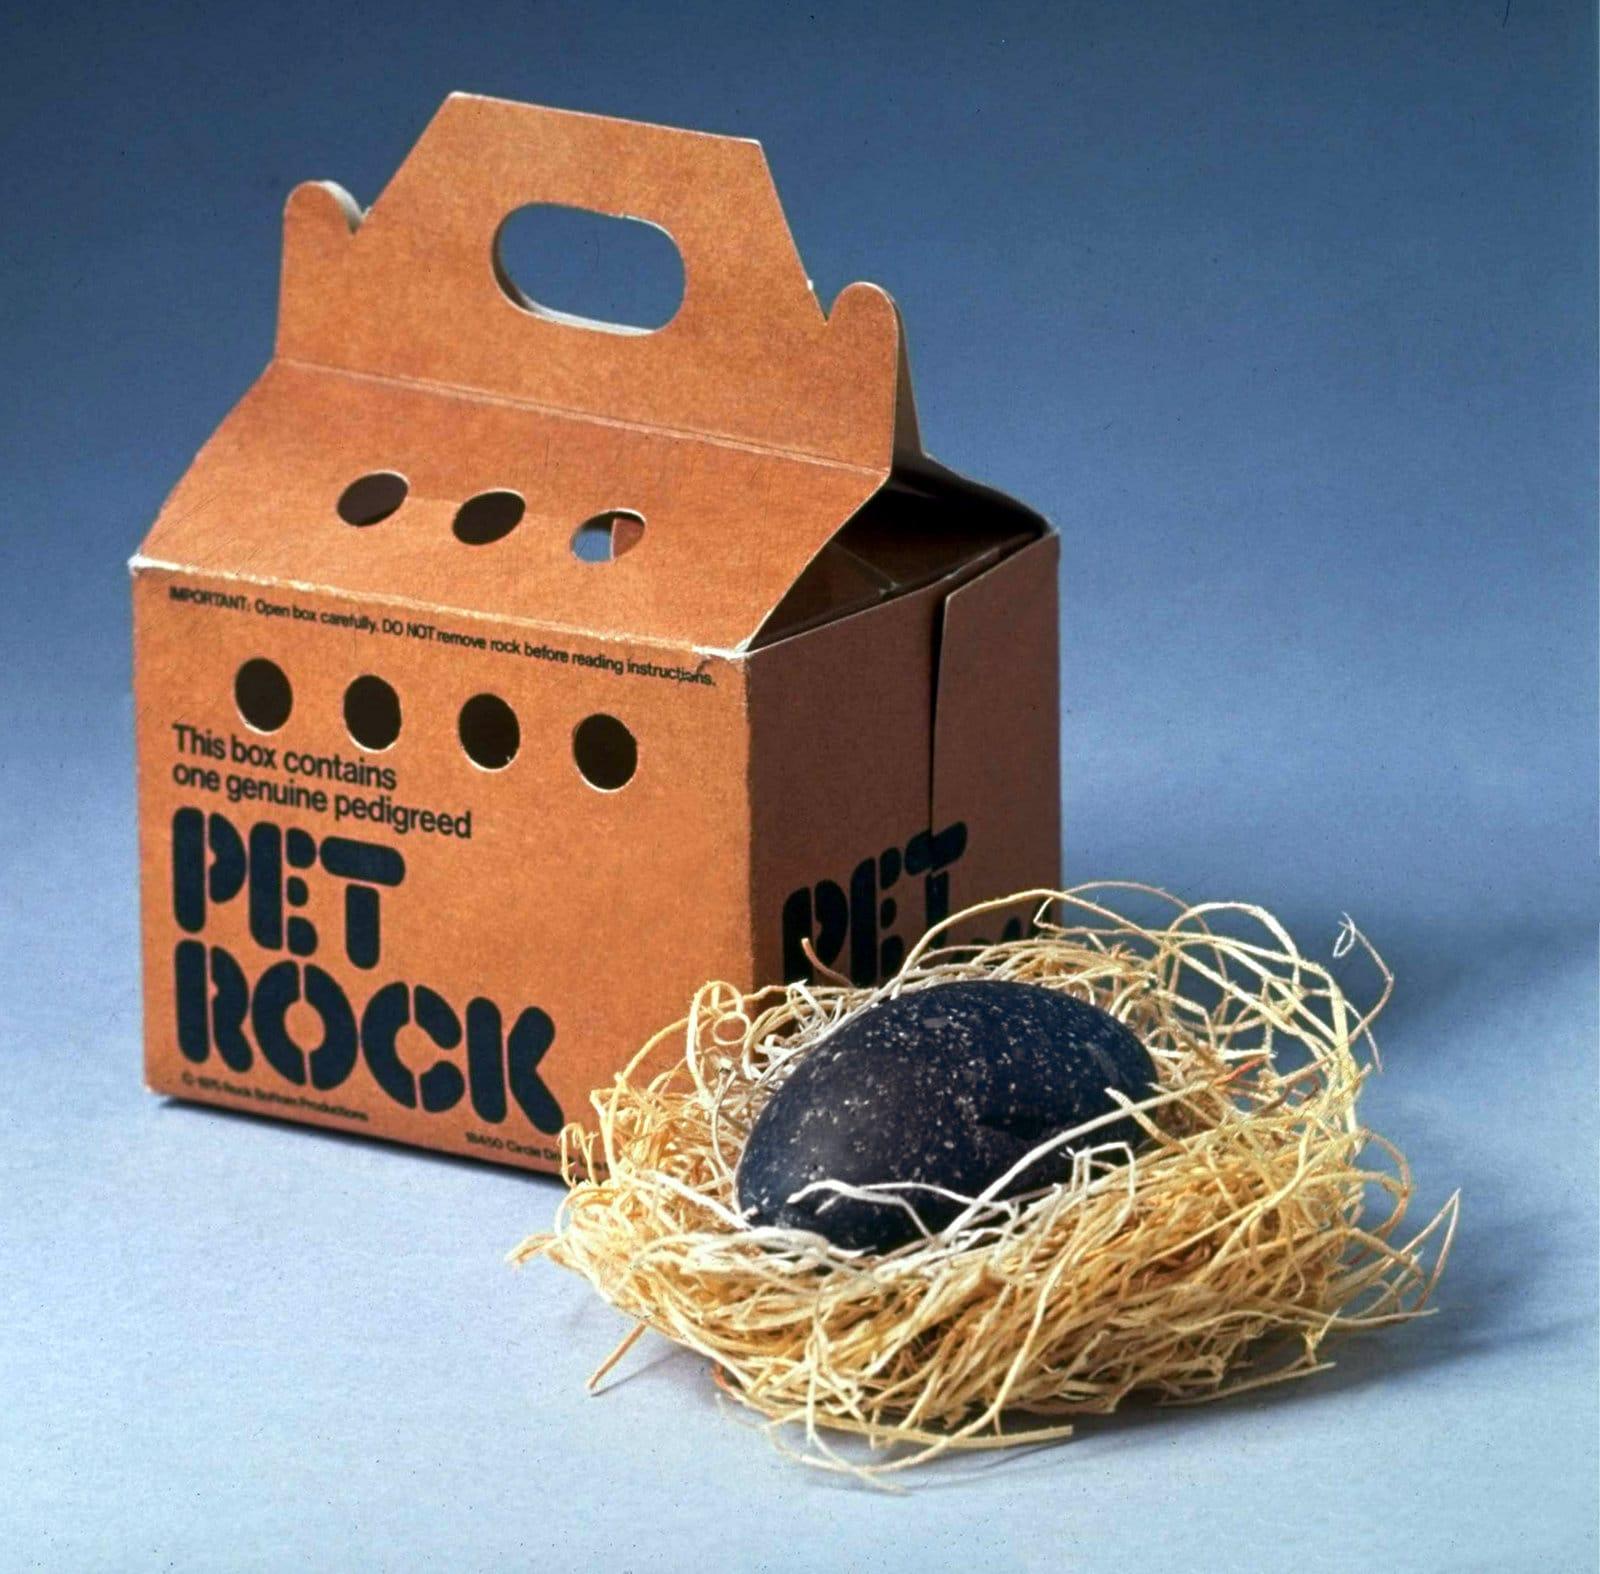 Vintage Pet Rock gag gift